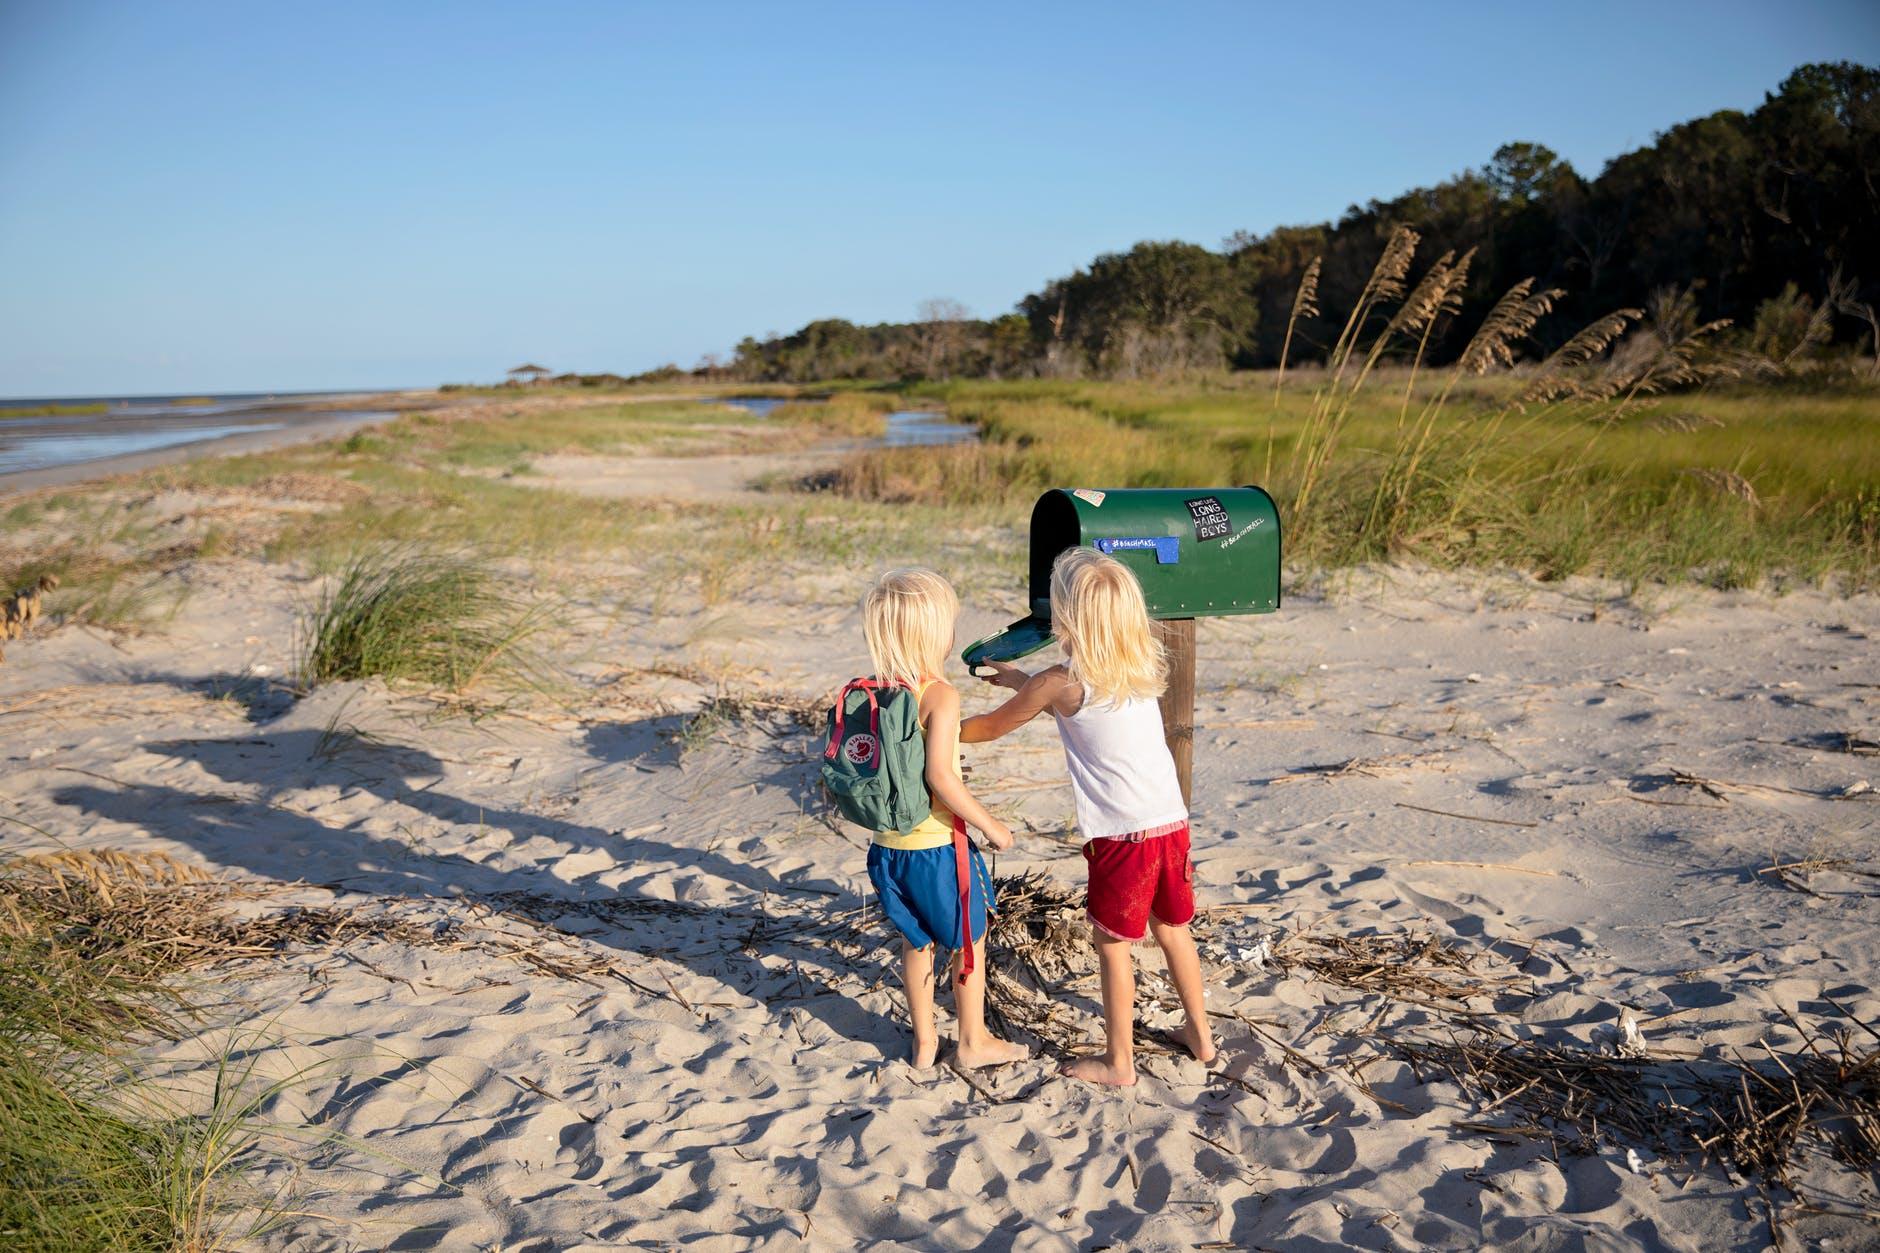 two children standing beside green mailbox